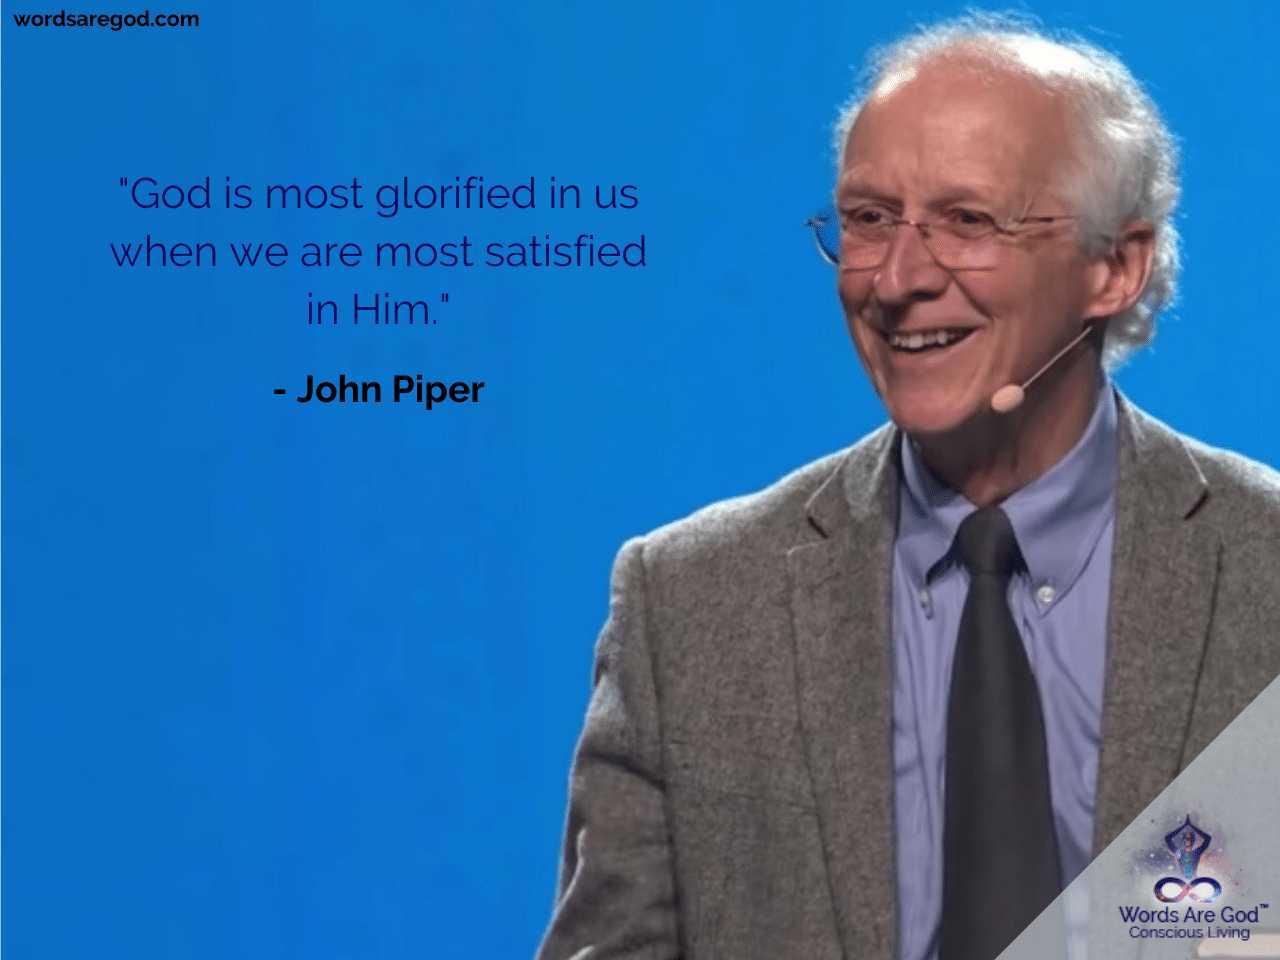 John Piper Life Quotes by John Piper